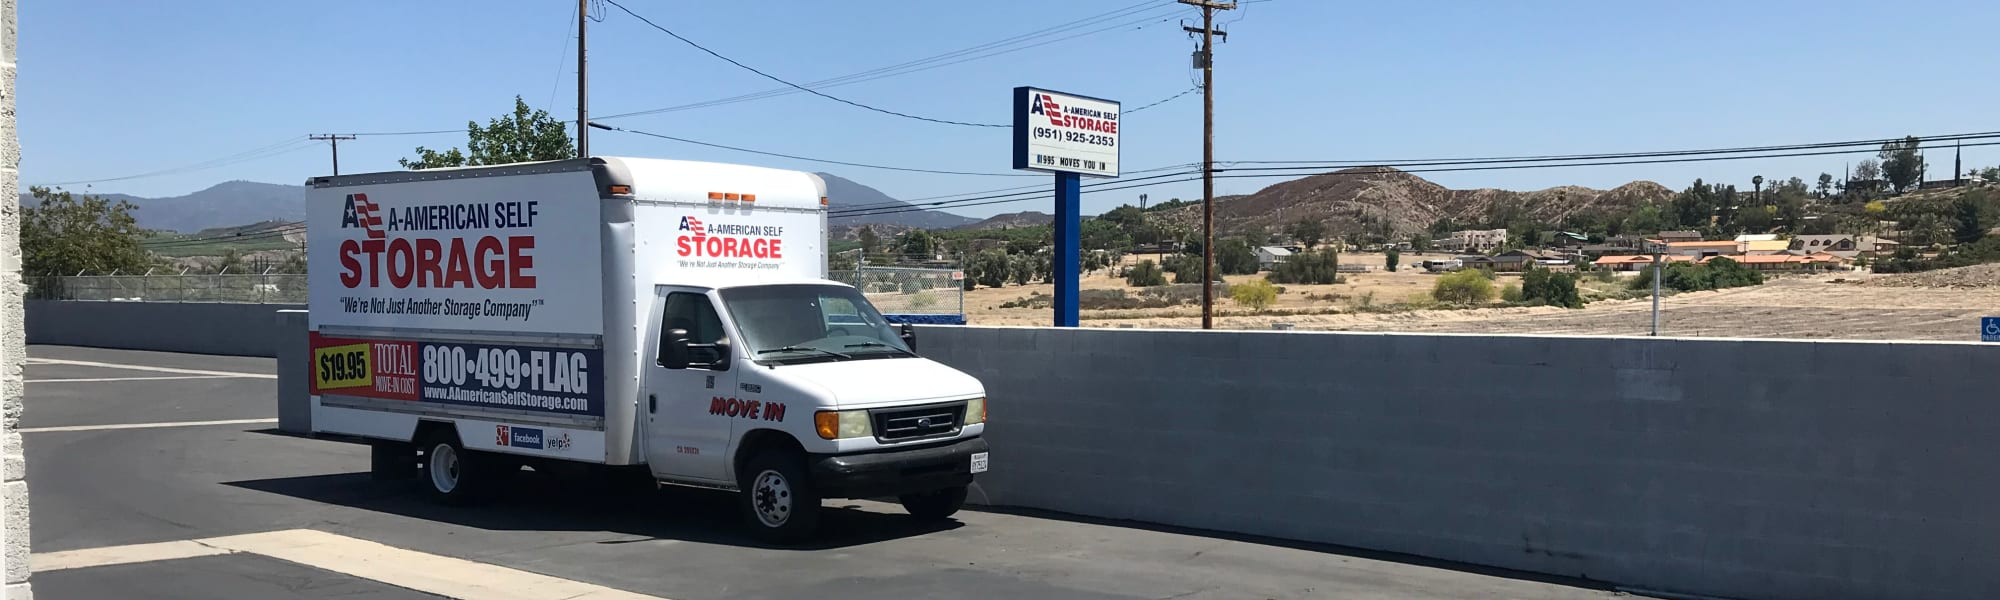 A-American Self Storage in Hemet, California